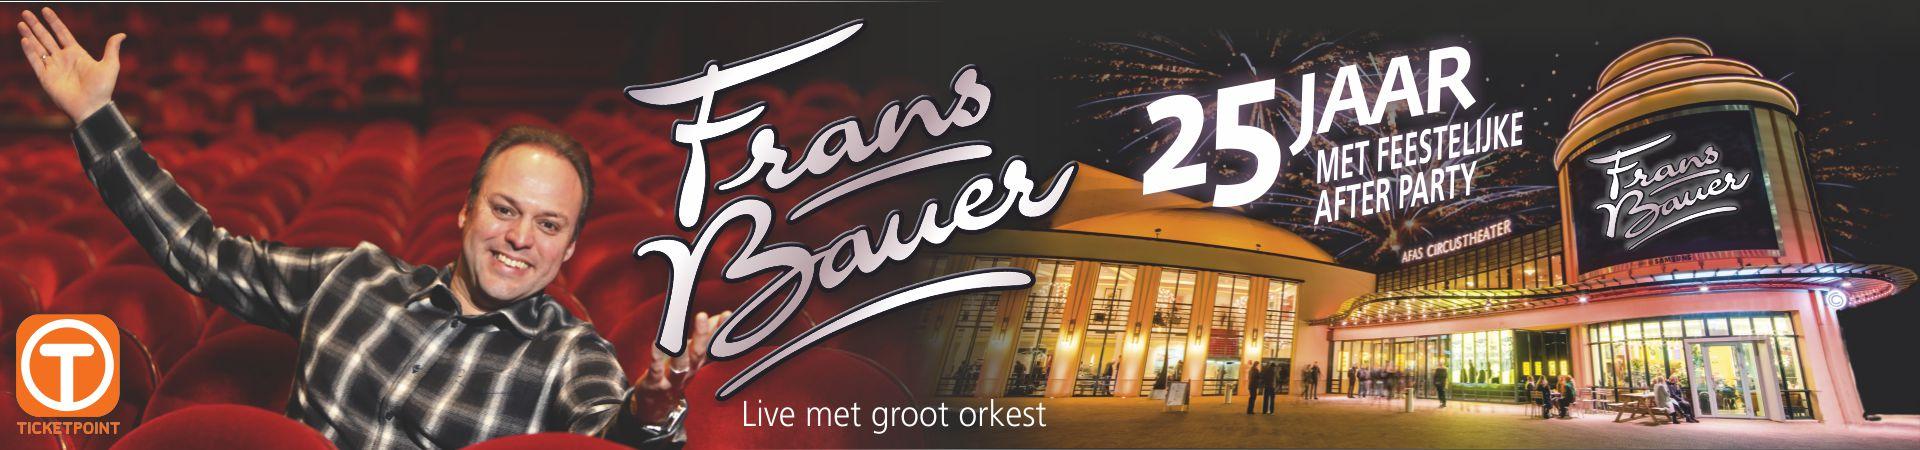 Frans Bauer 1920x450